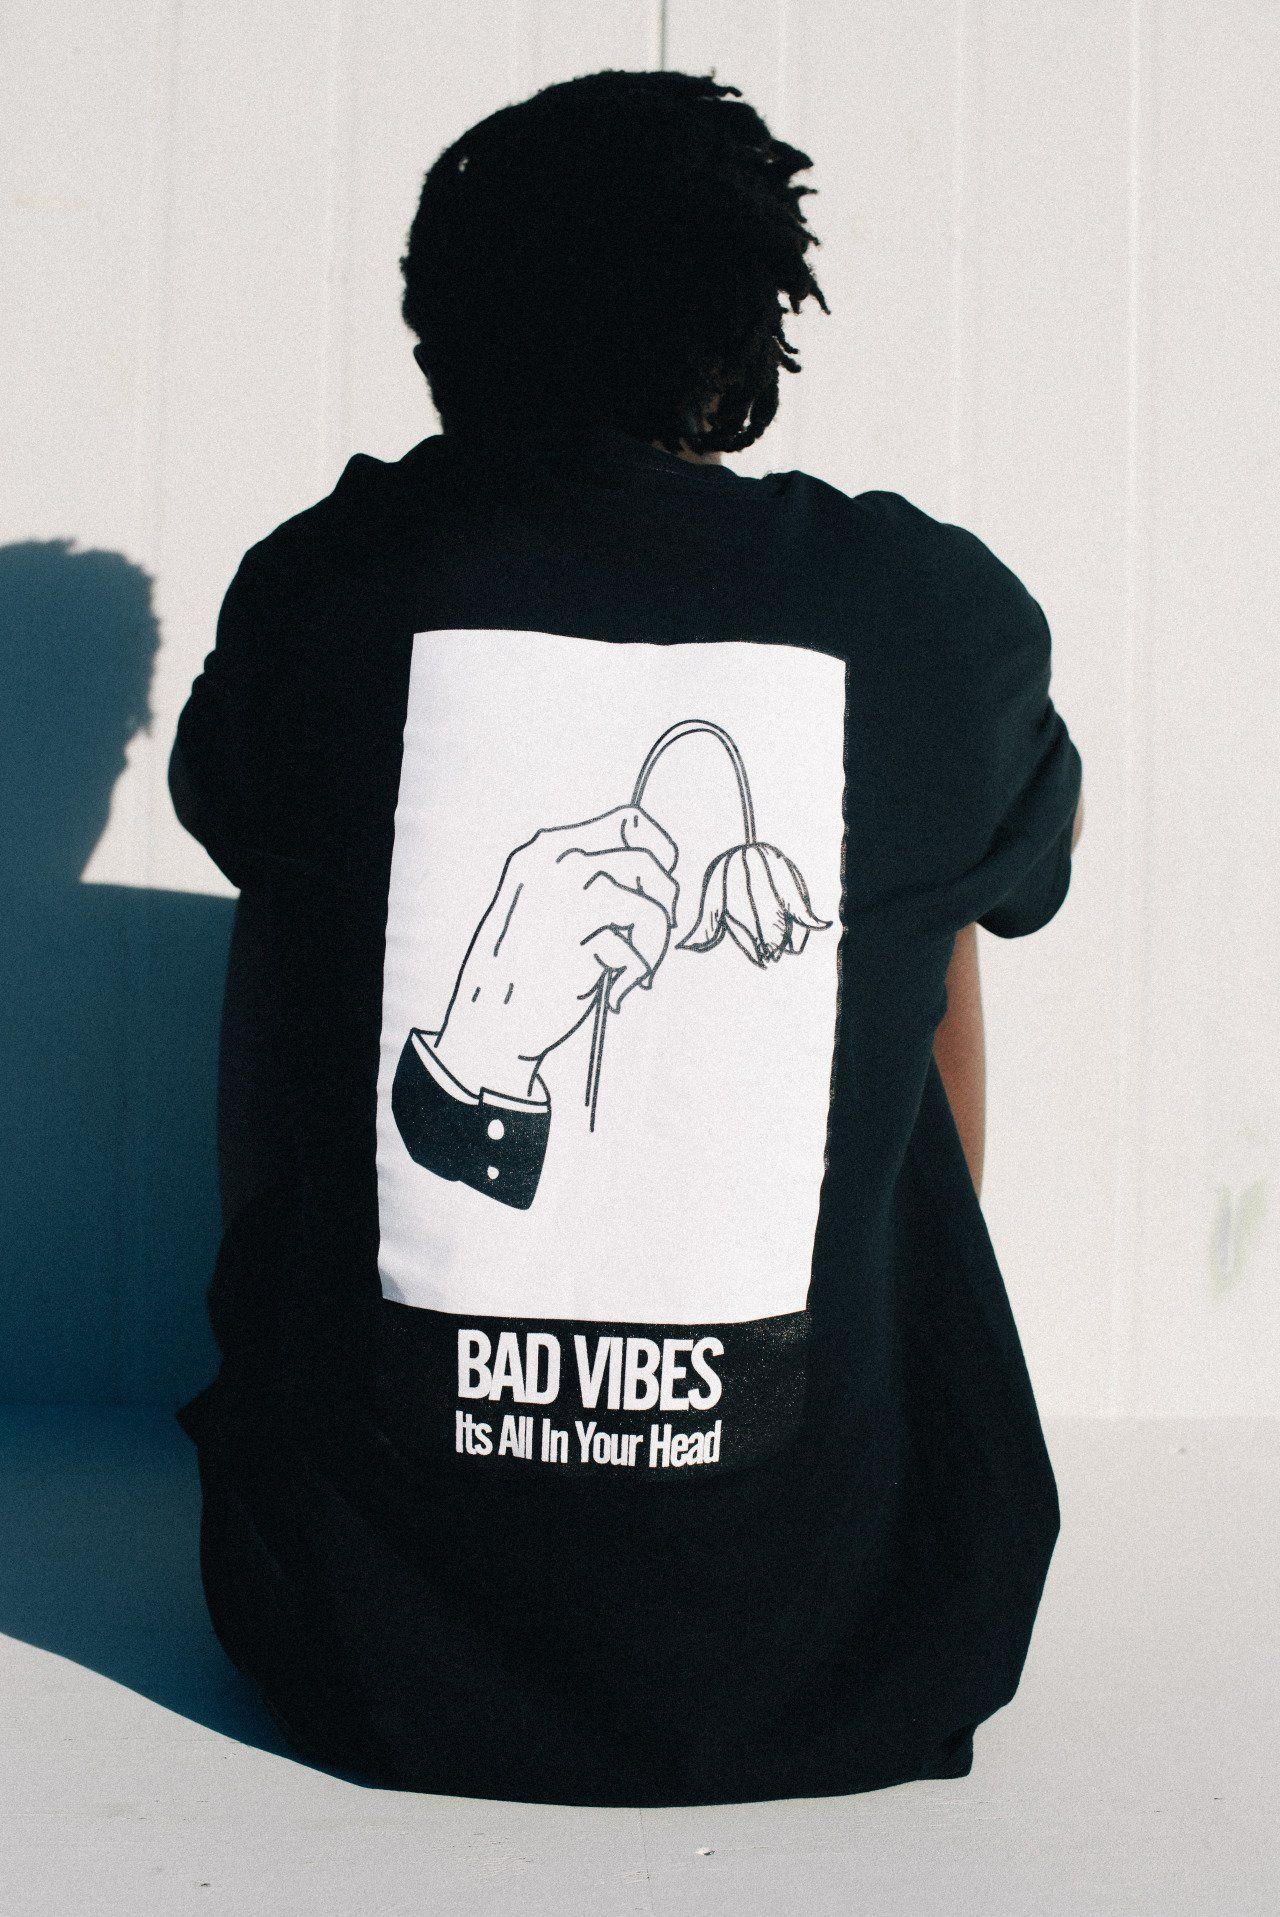 Archillect on | Shirt designs, T shirt, Tees